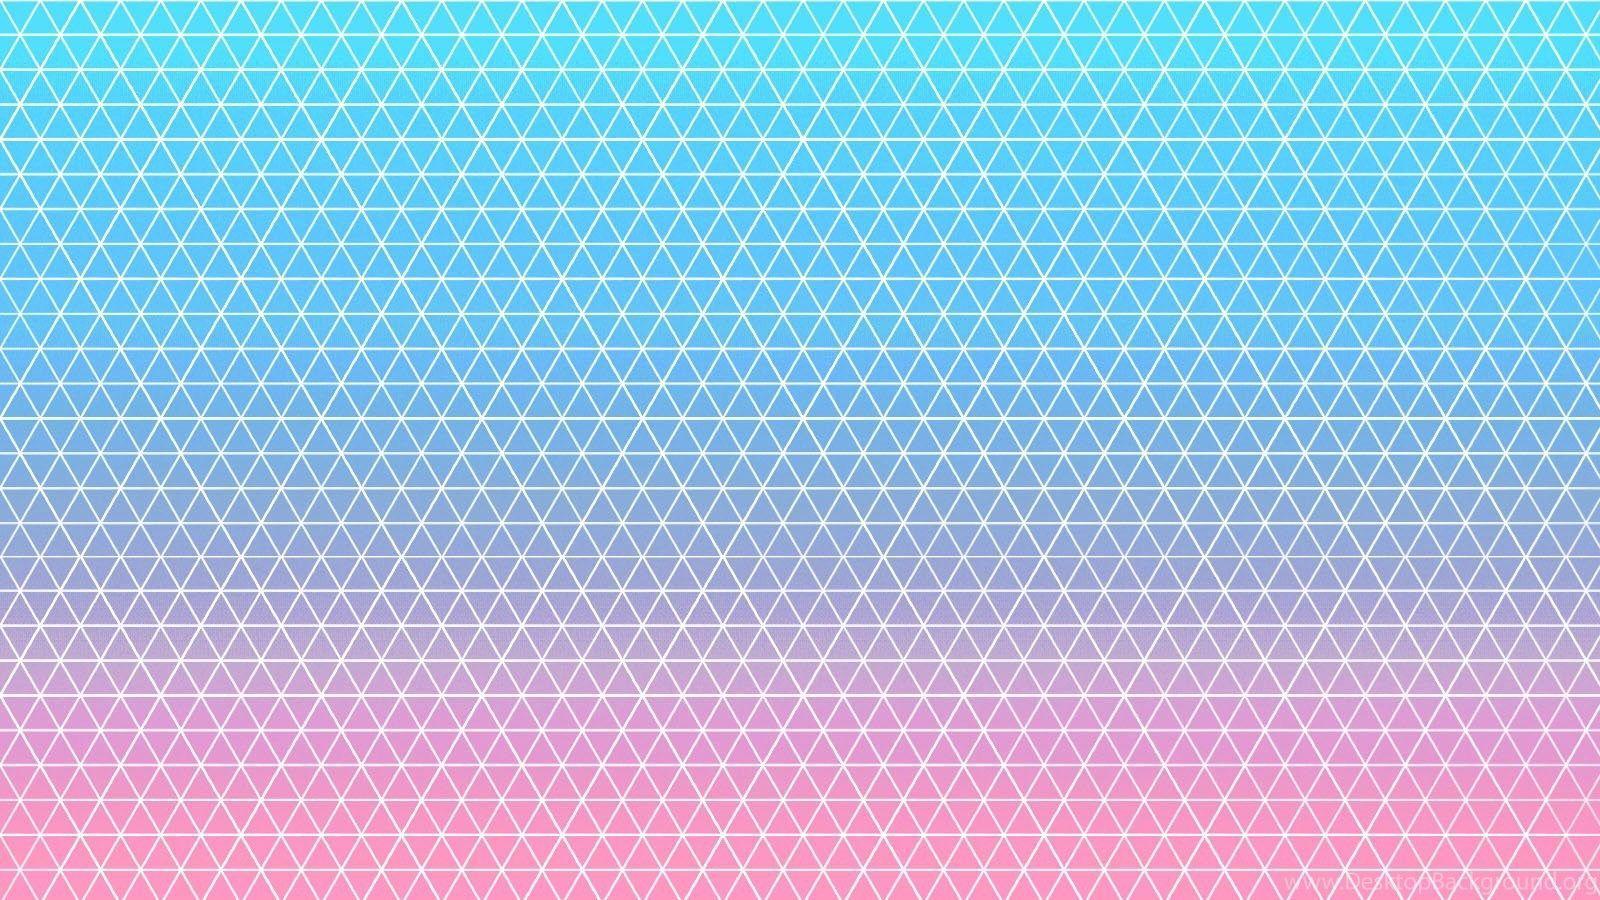 Blue Aesthetic Tumblr Desktop Wallpapers Top Free Blue Aesthetic Tumblr Desktop Backgrounds Wallpaperaccess